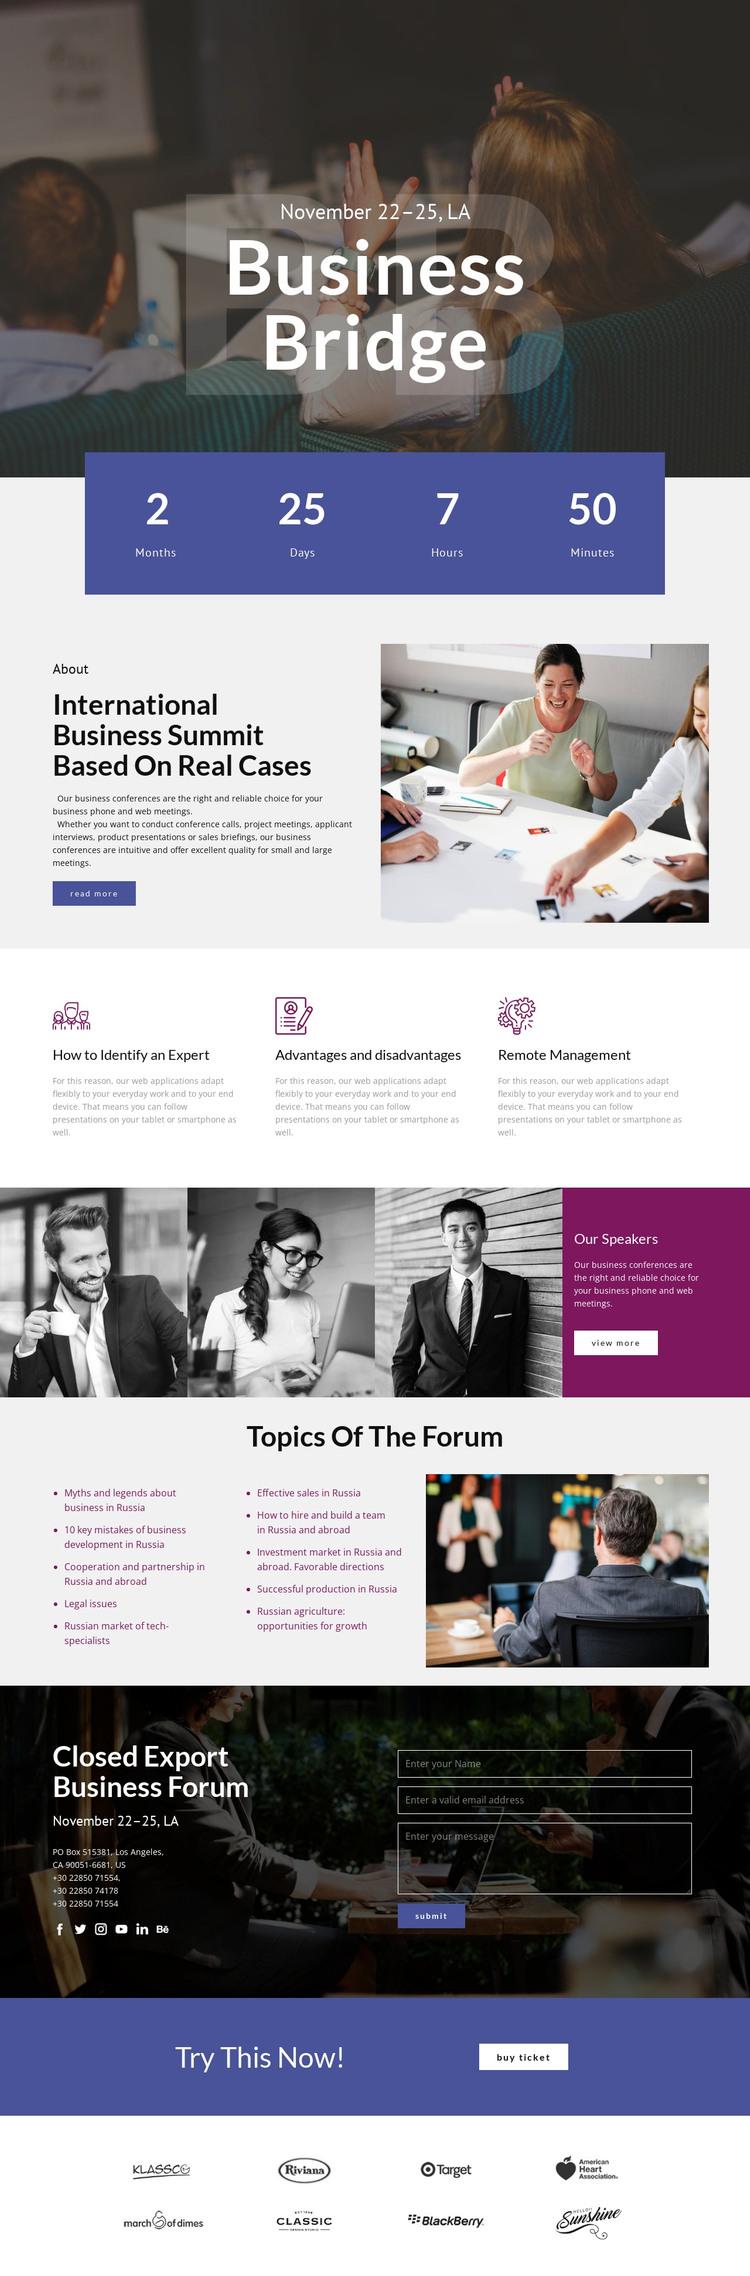 Business Bridge Web Design